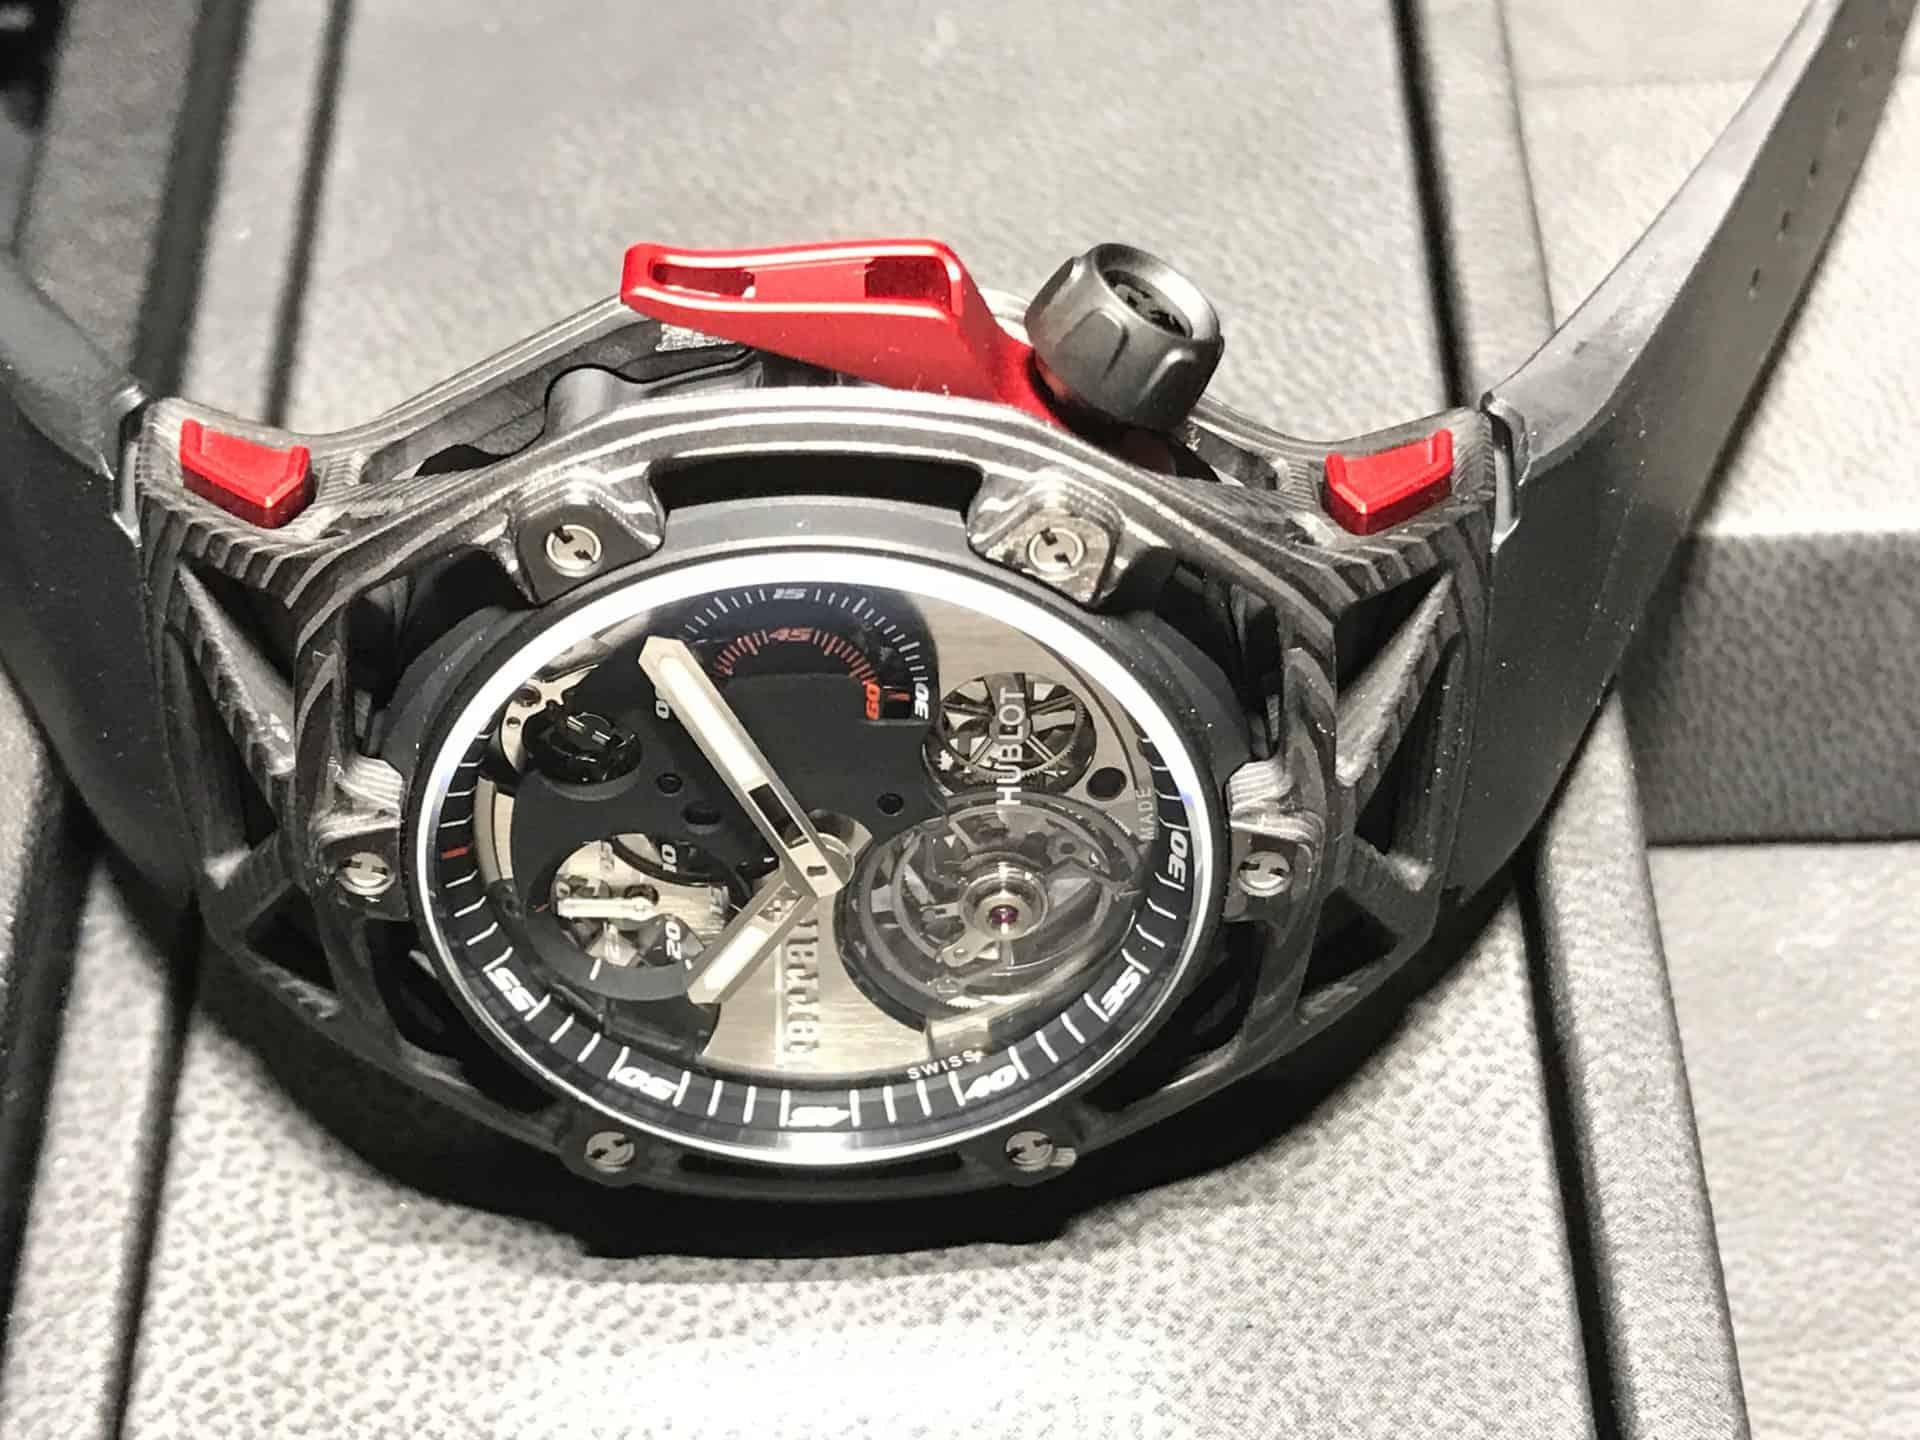 Hublot . Techframe Ferrari 70 years Tourbillon Chronograph - 2017_3